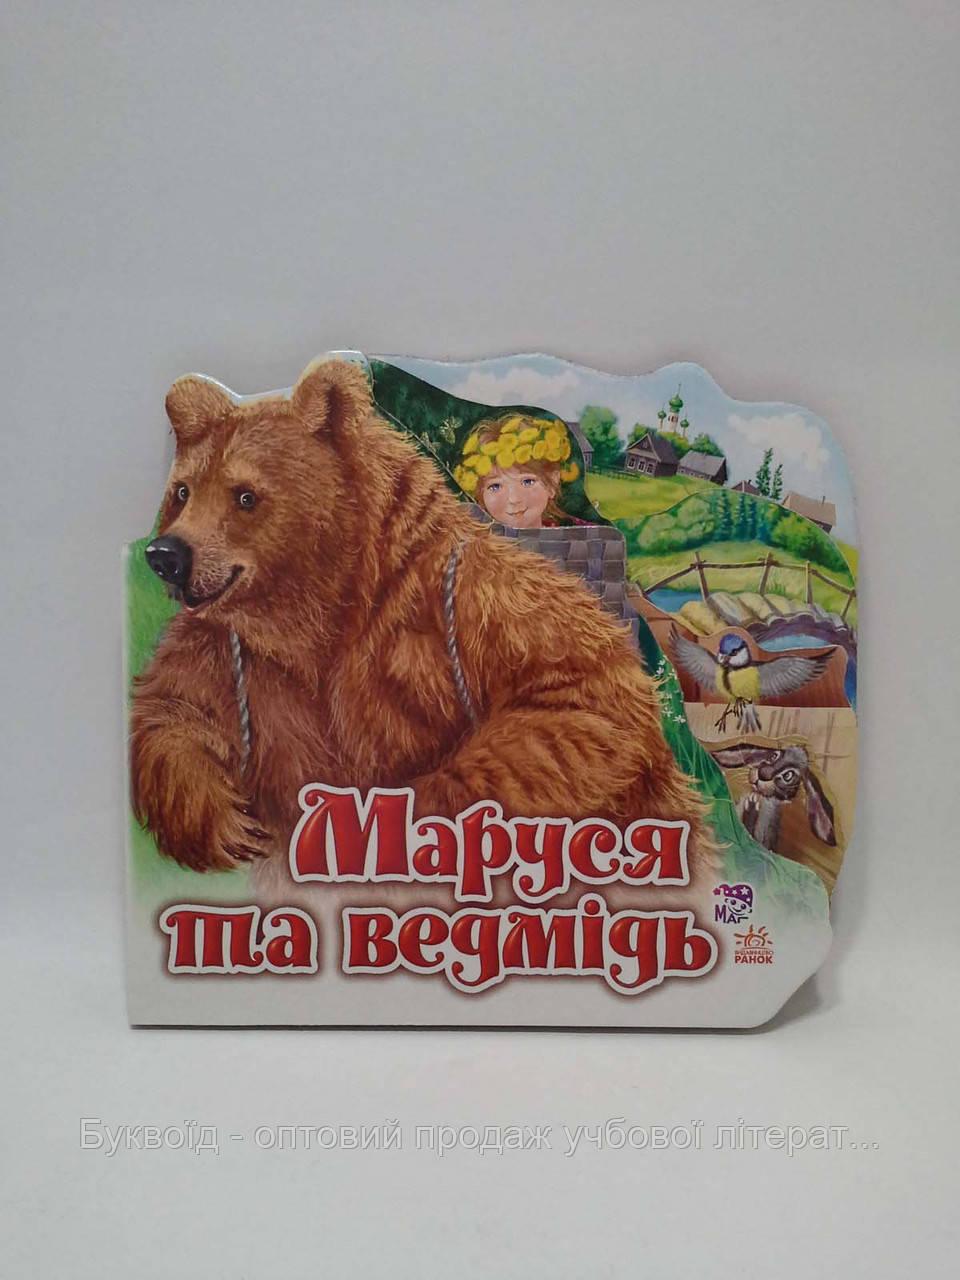 Ранок Картон Улюблена казка Мини Маруся та ведмідь